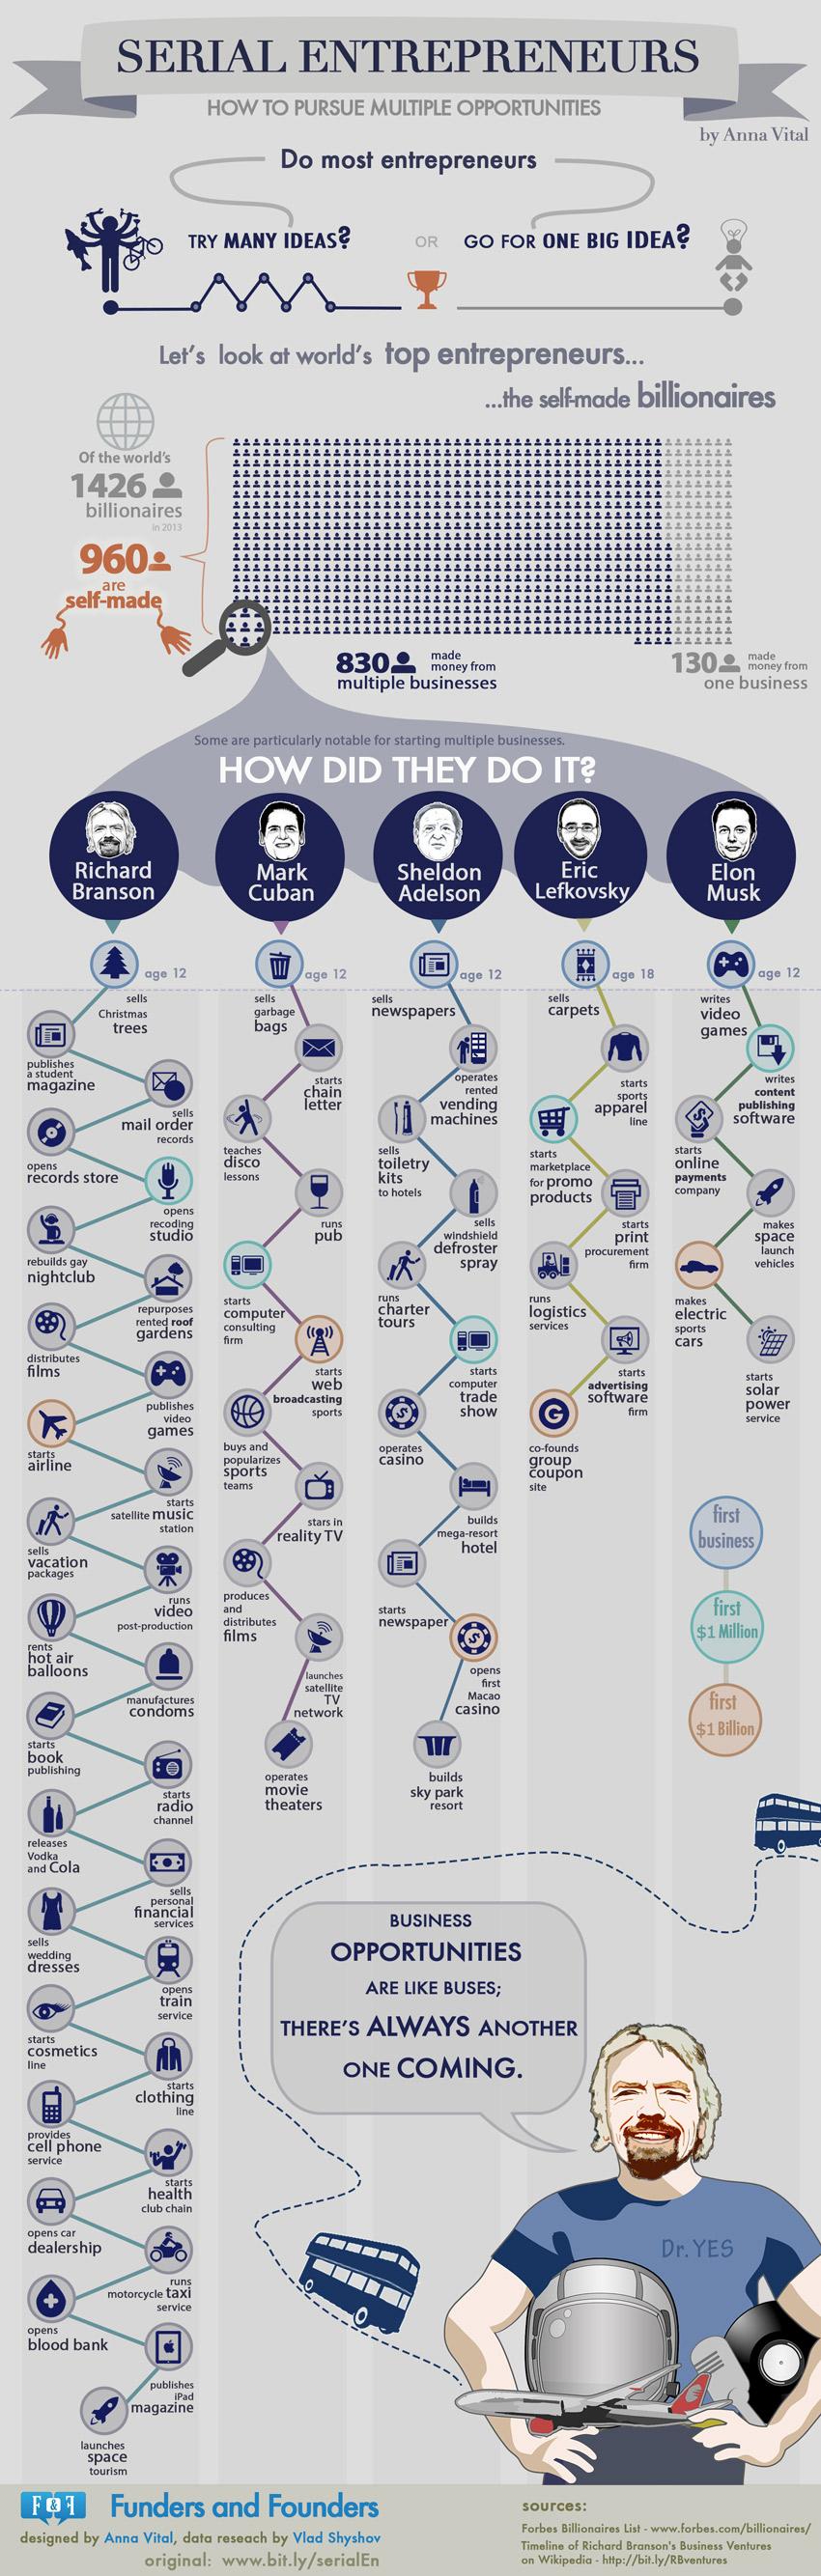 wild-crazy-career-paths-5-self-made